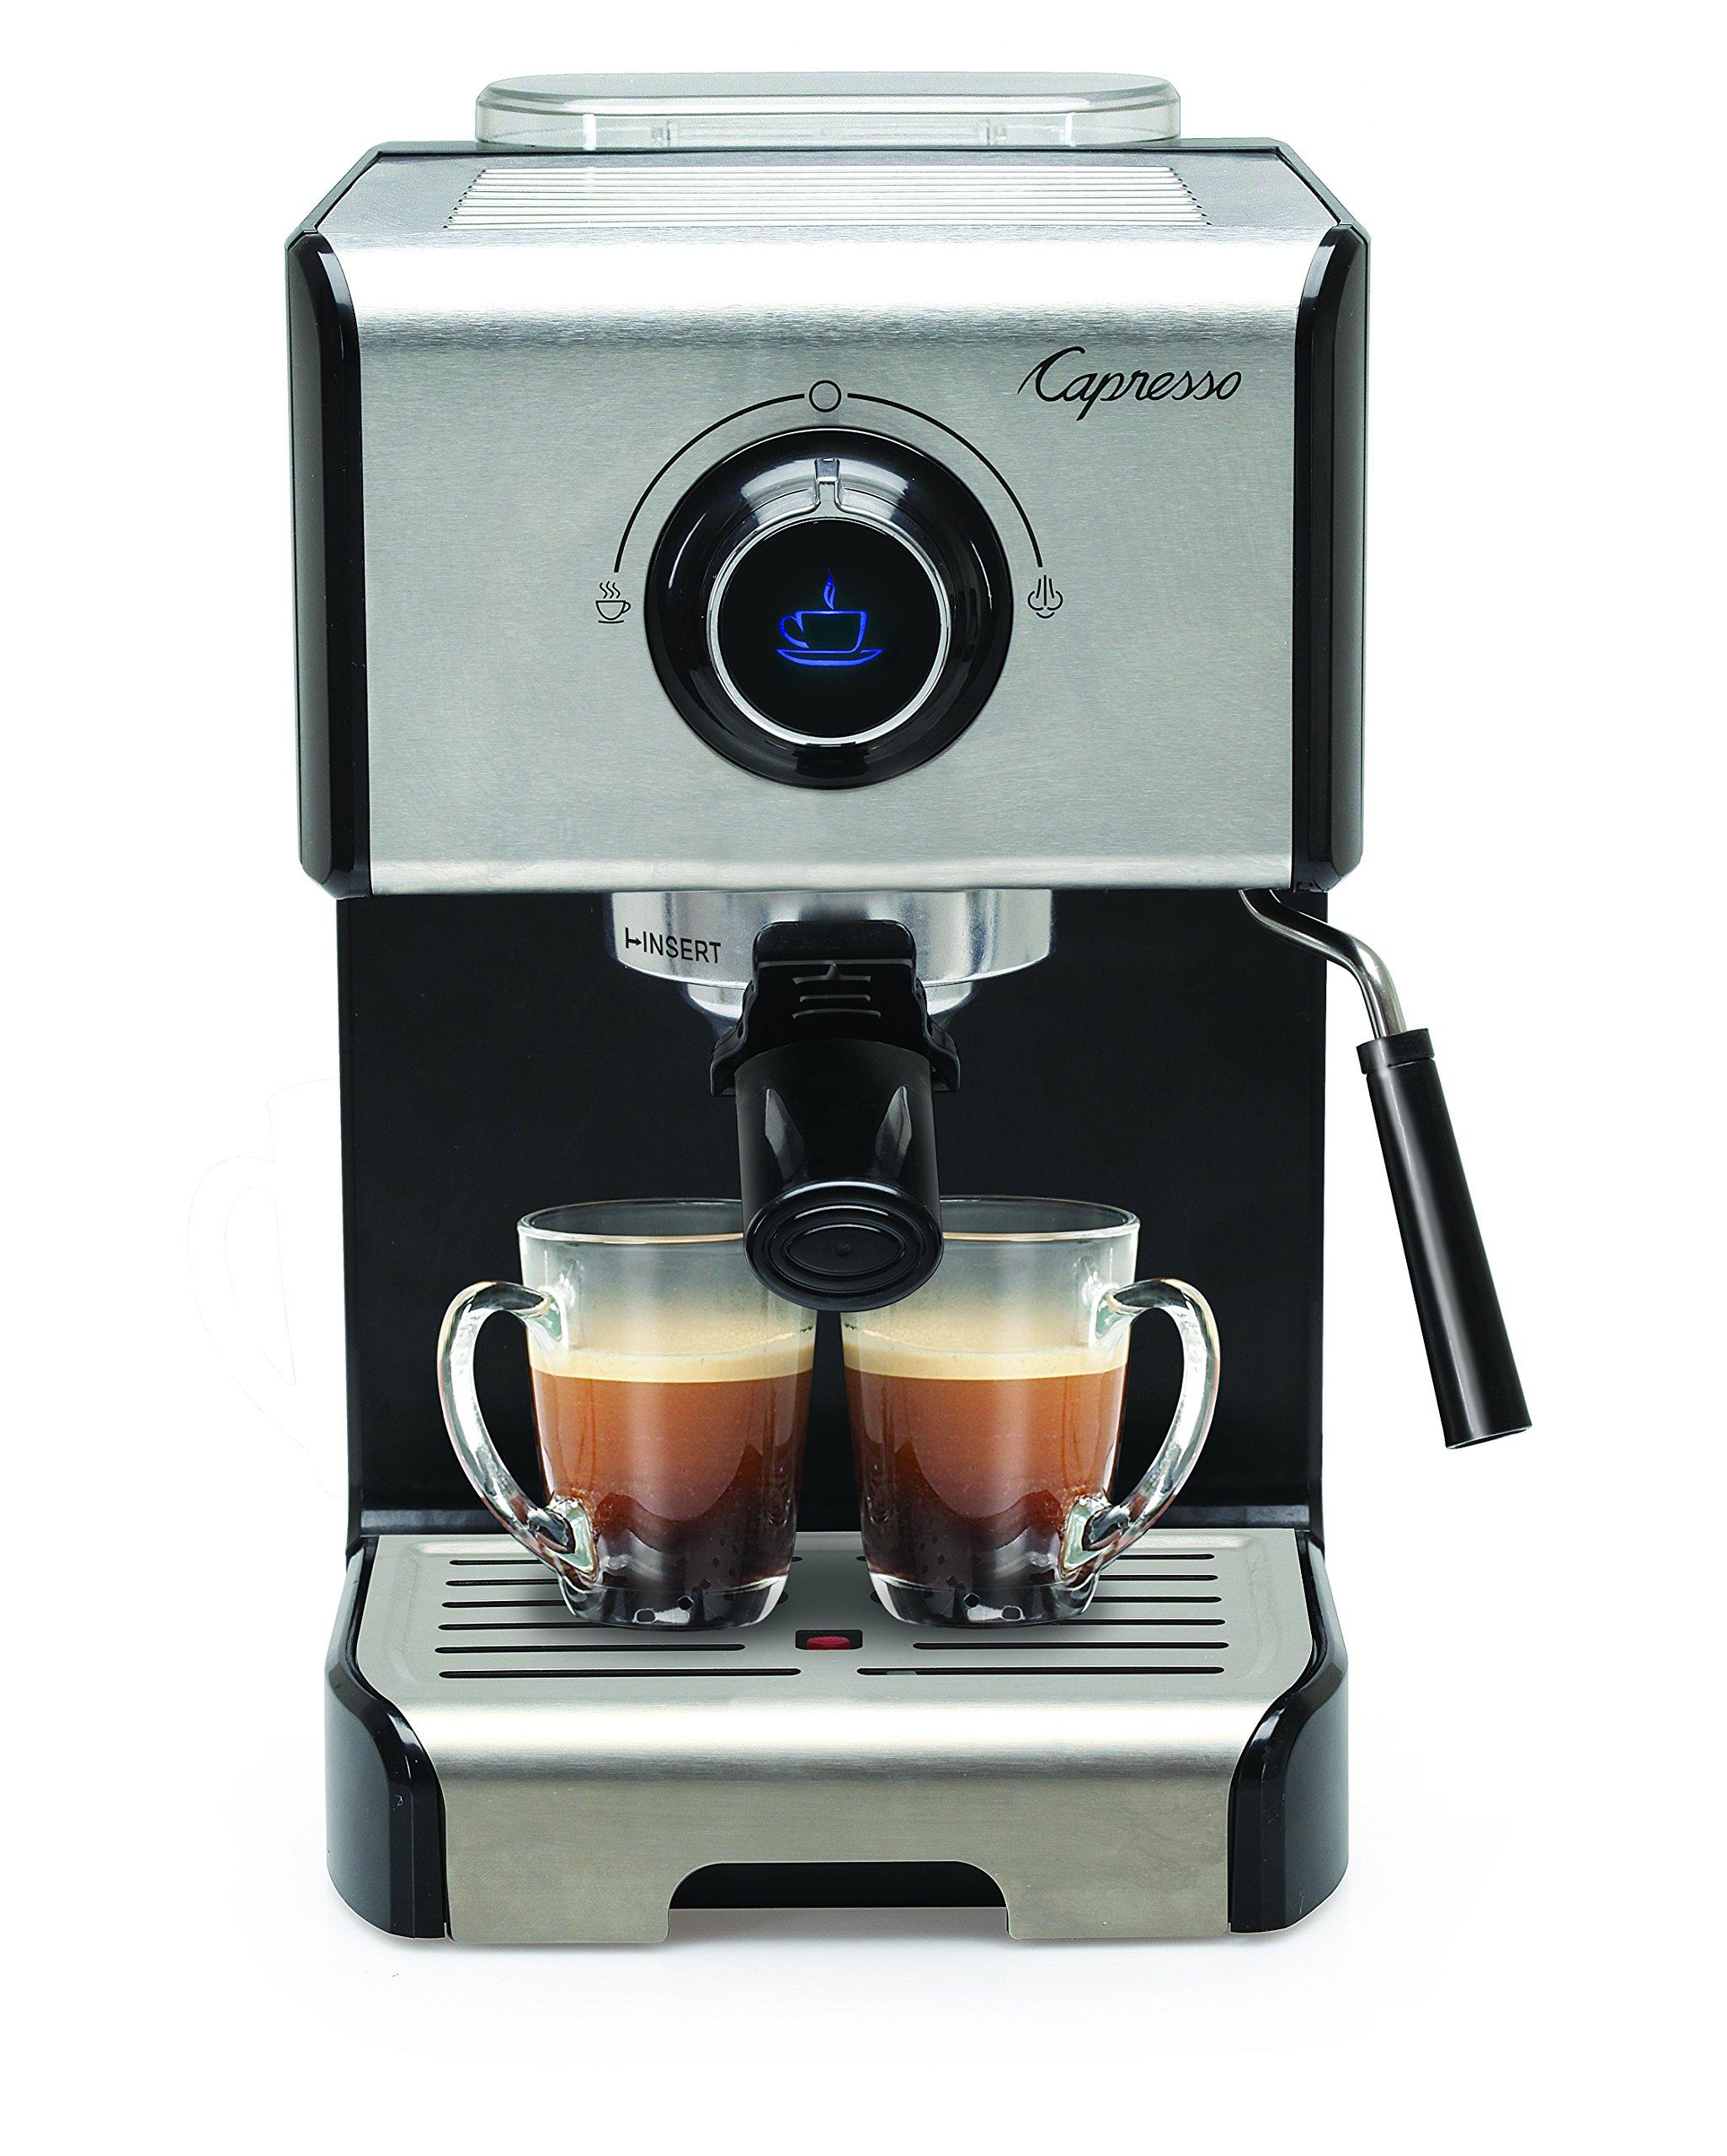 Capresso 123.05 EC300 Cappuccino Espresso Machine, 42, Stainless Steel/Black by Capresso